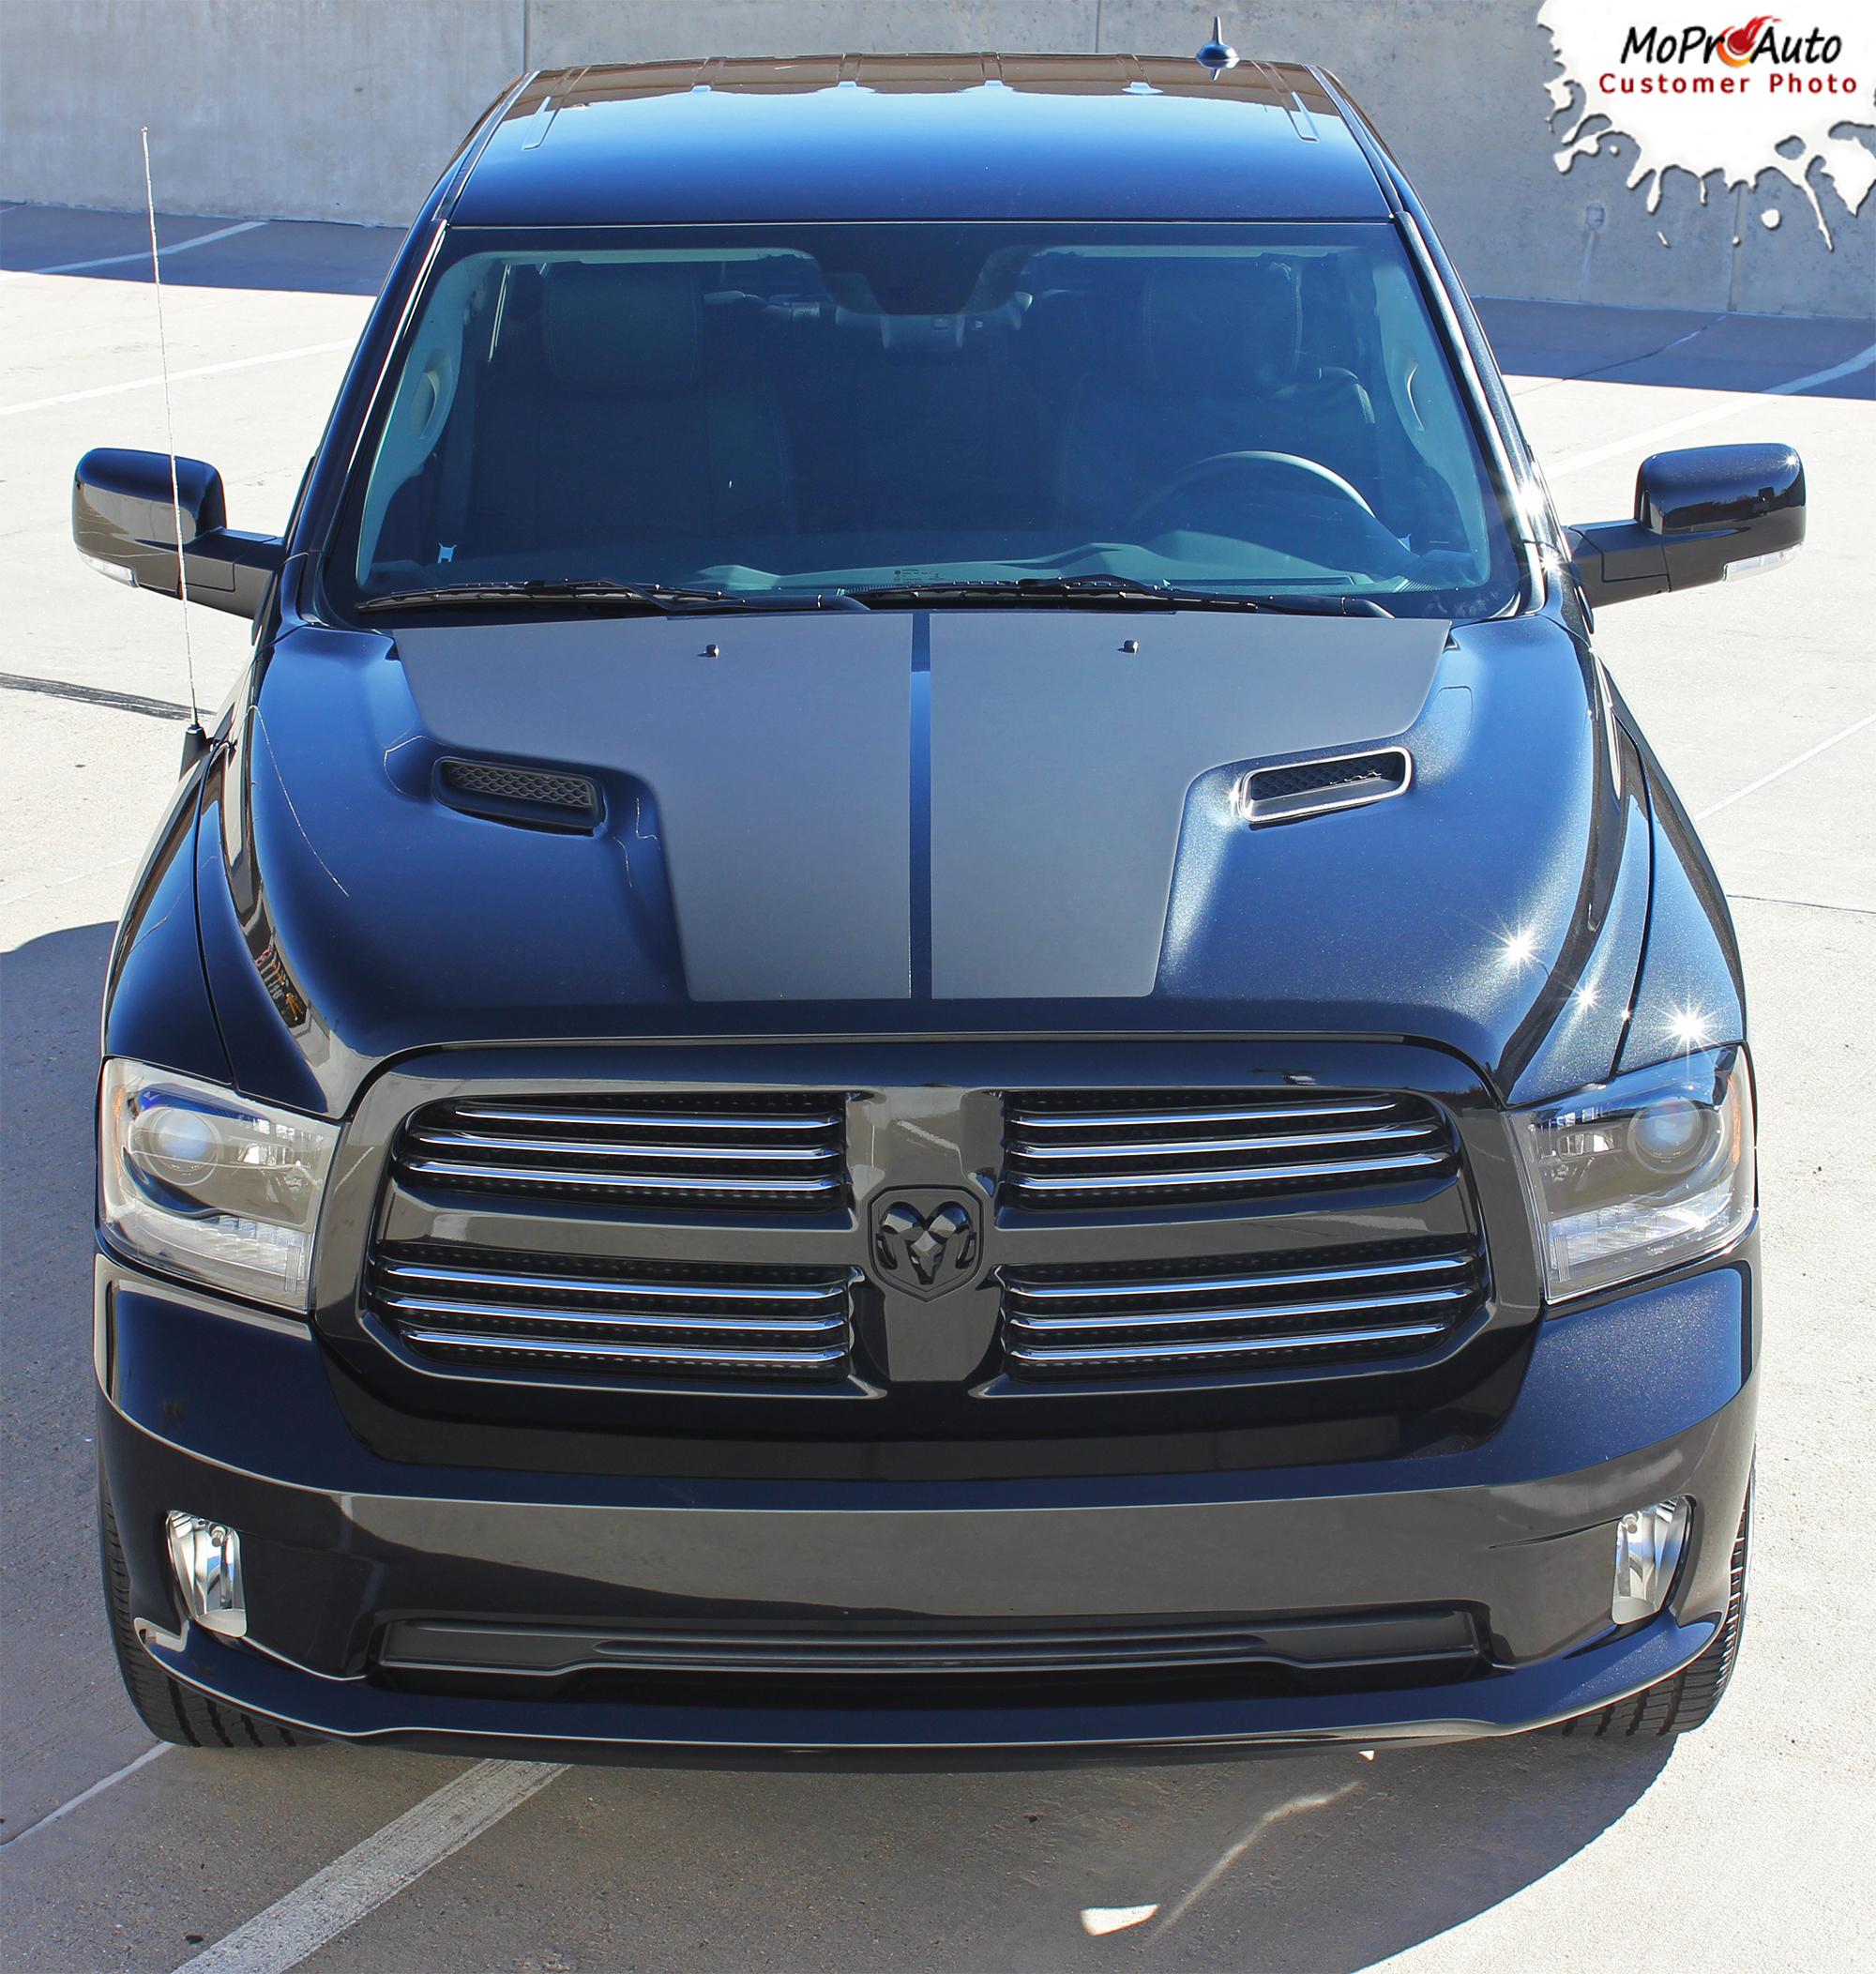 RAM HEMI HOOD : 2018 2017 2016 2015 2014 2013 2012 2011 2010 2009 Dodge Ram Vinyl Graphics Kit